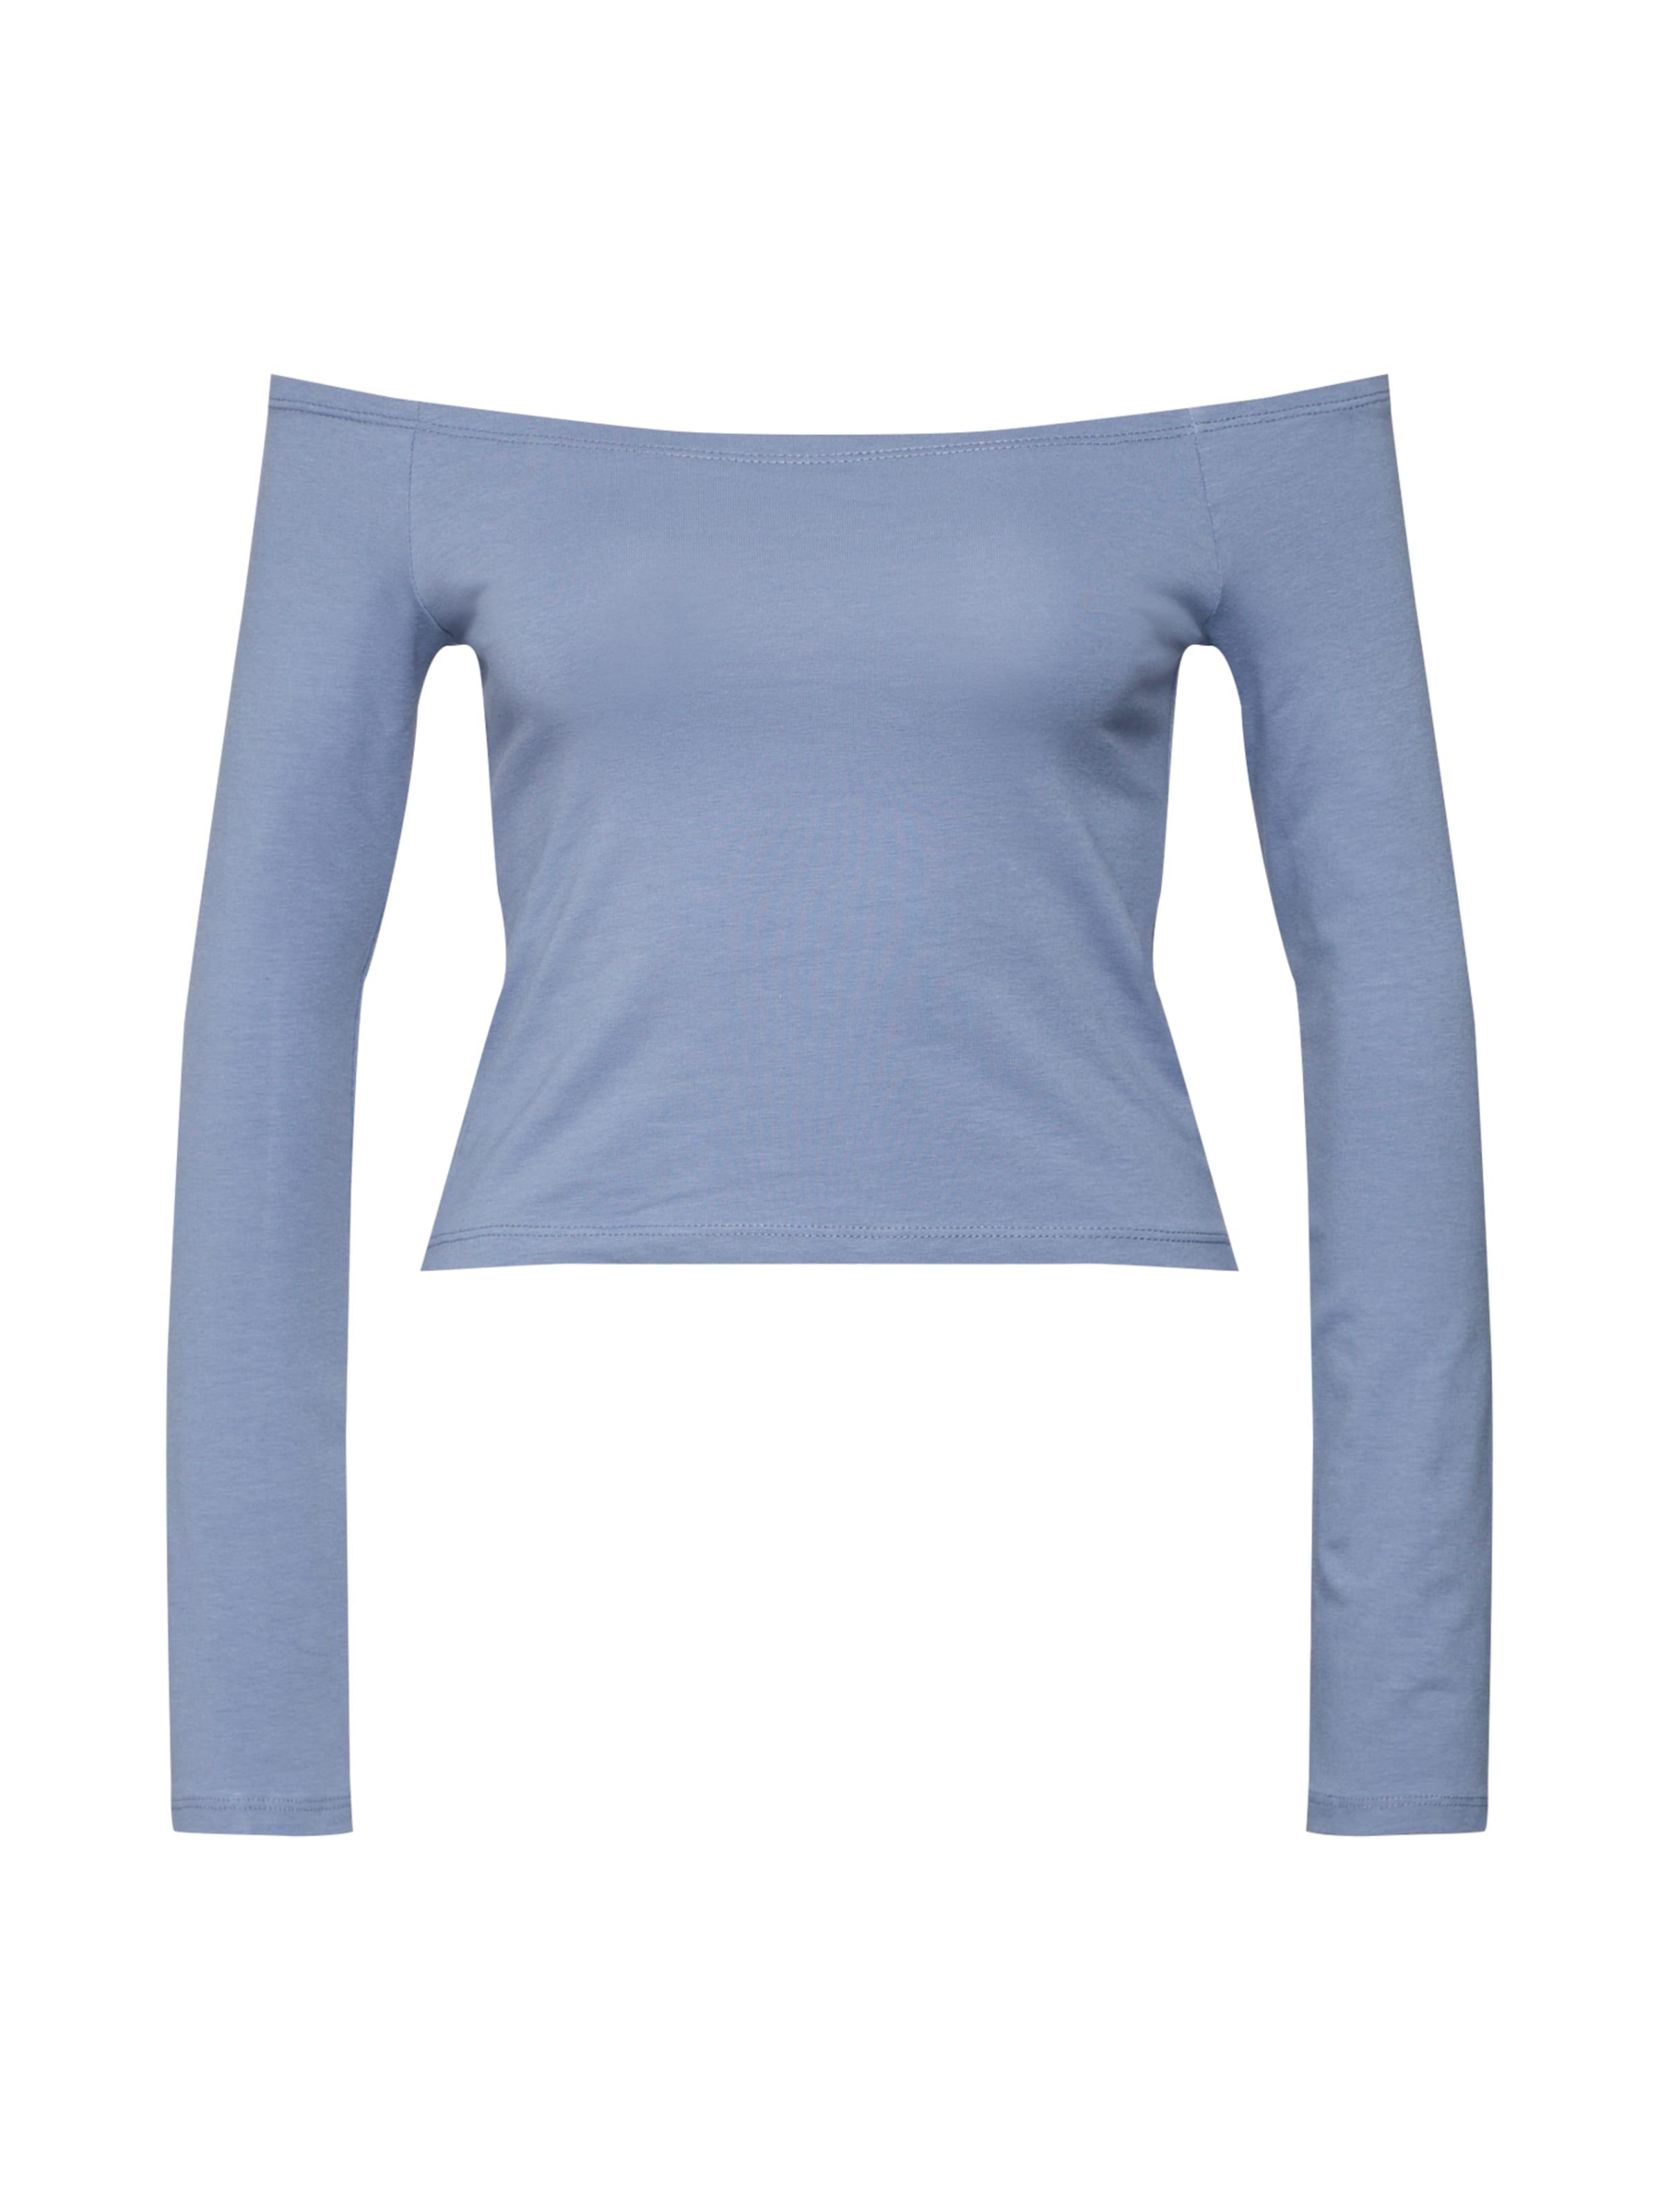 kd Na In Shirt Blau lTFJcK1